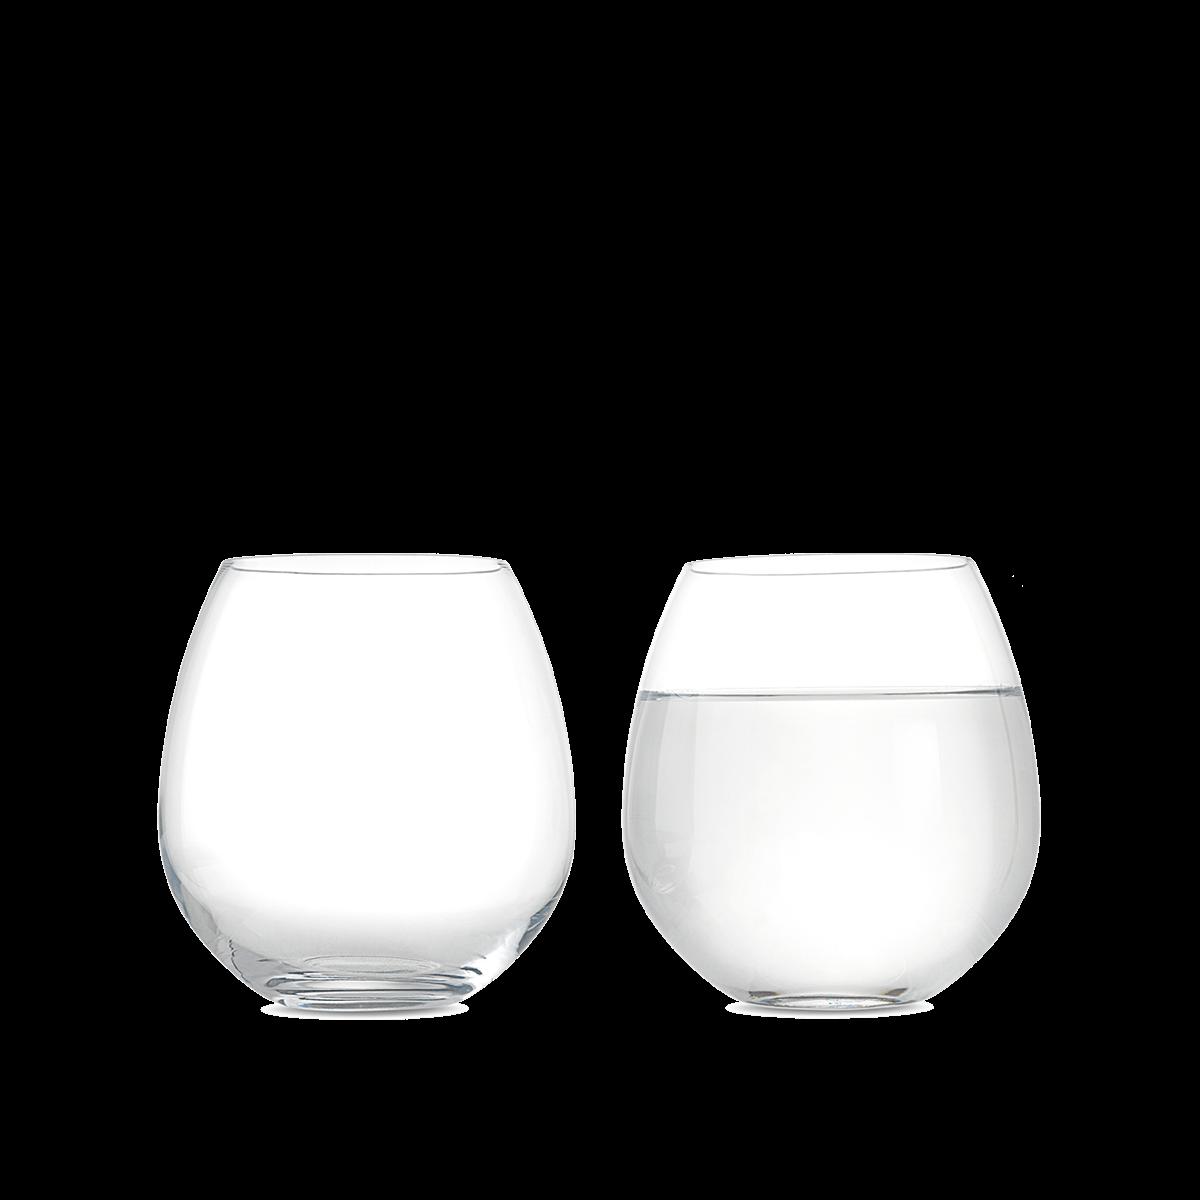 ROSENDAHL Premium vandglas 52 cl 2 stk